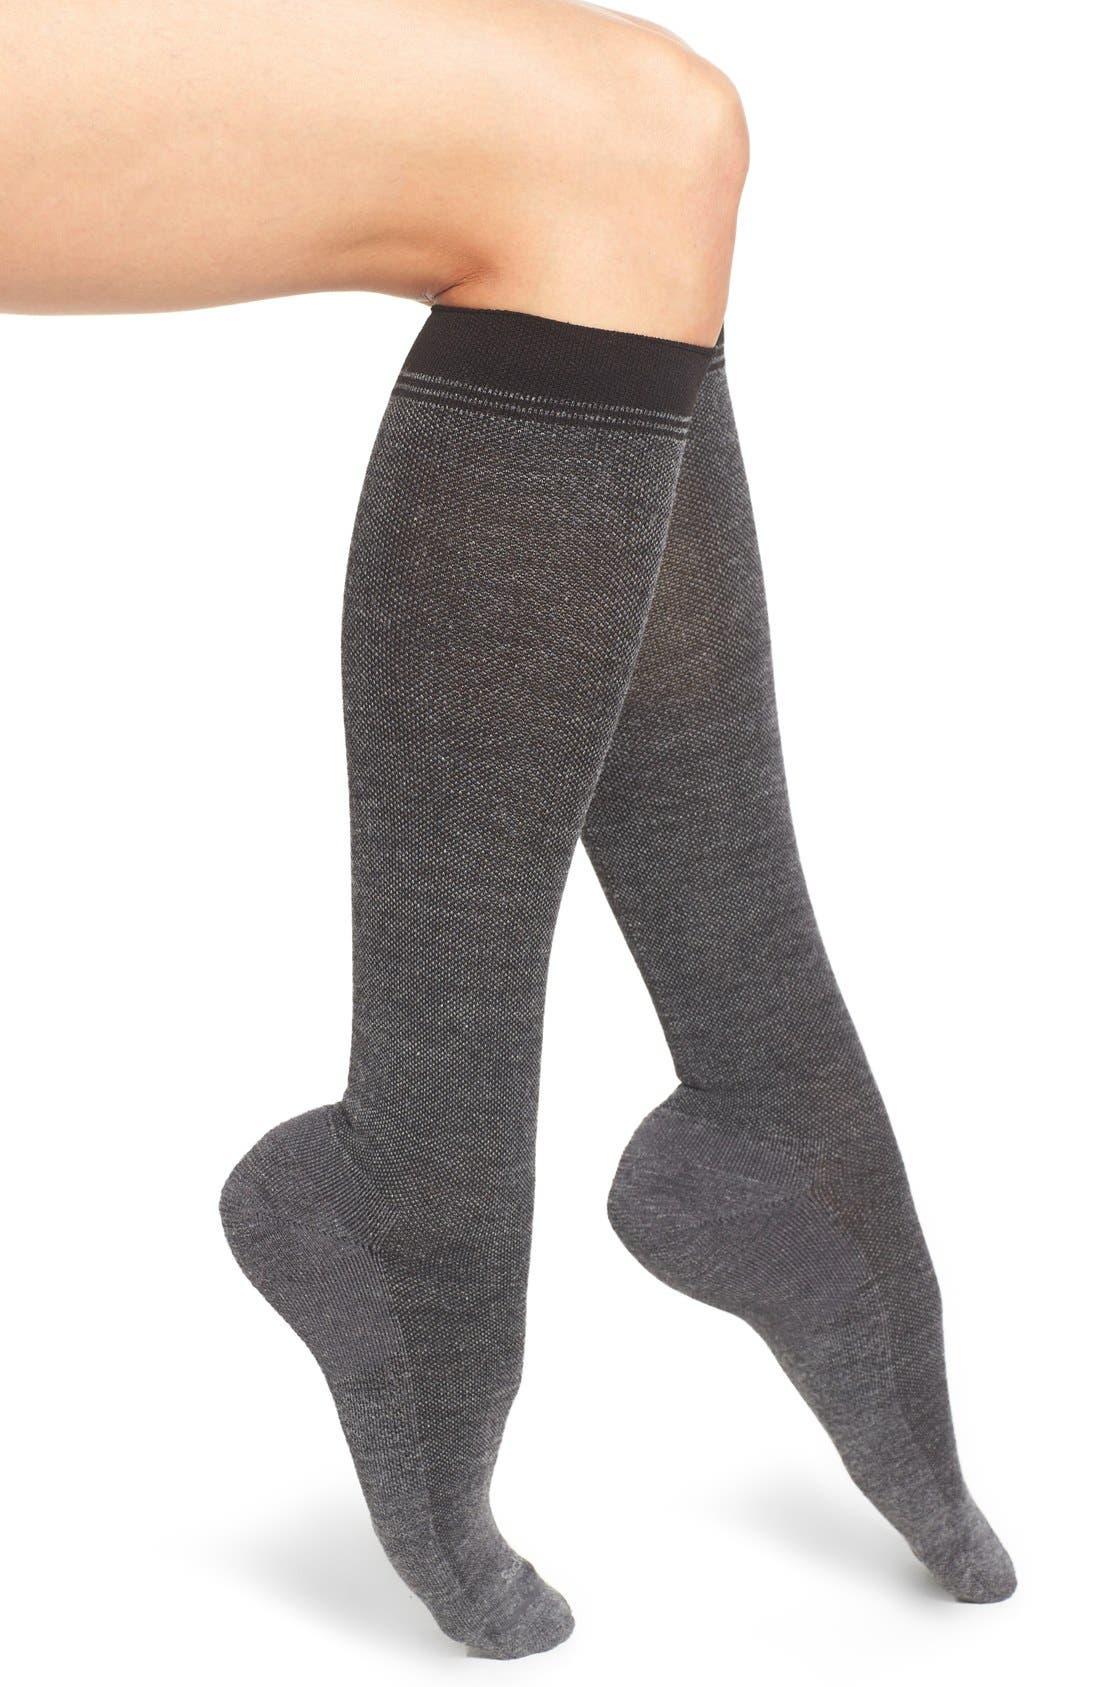 Main Image - Sockwell 'Rejuvenator' Compression Knee Socks